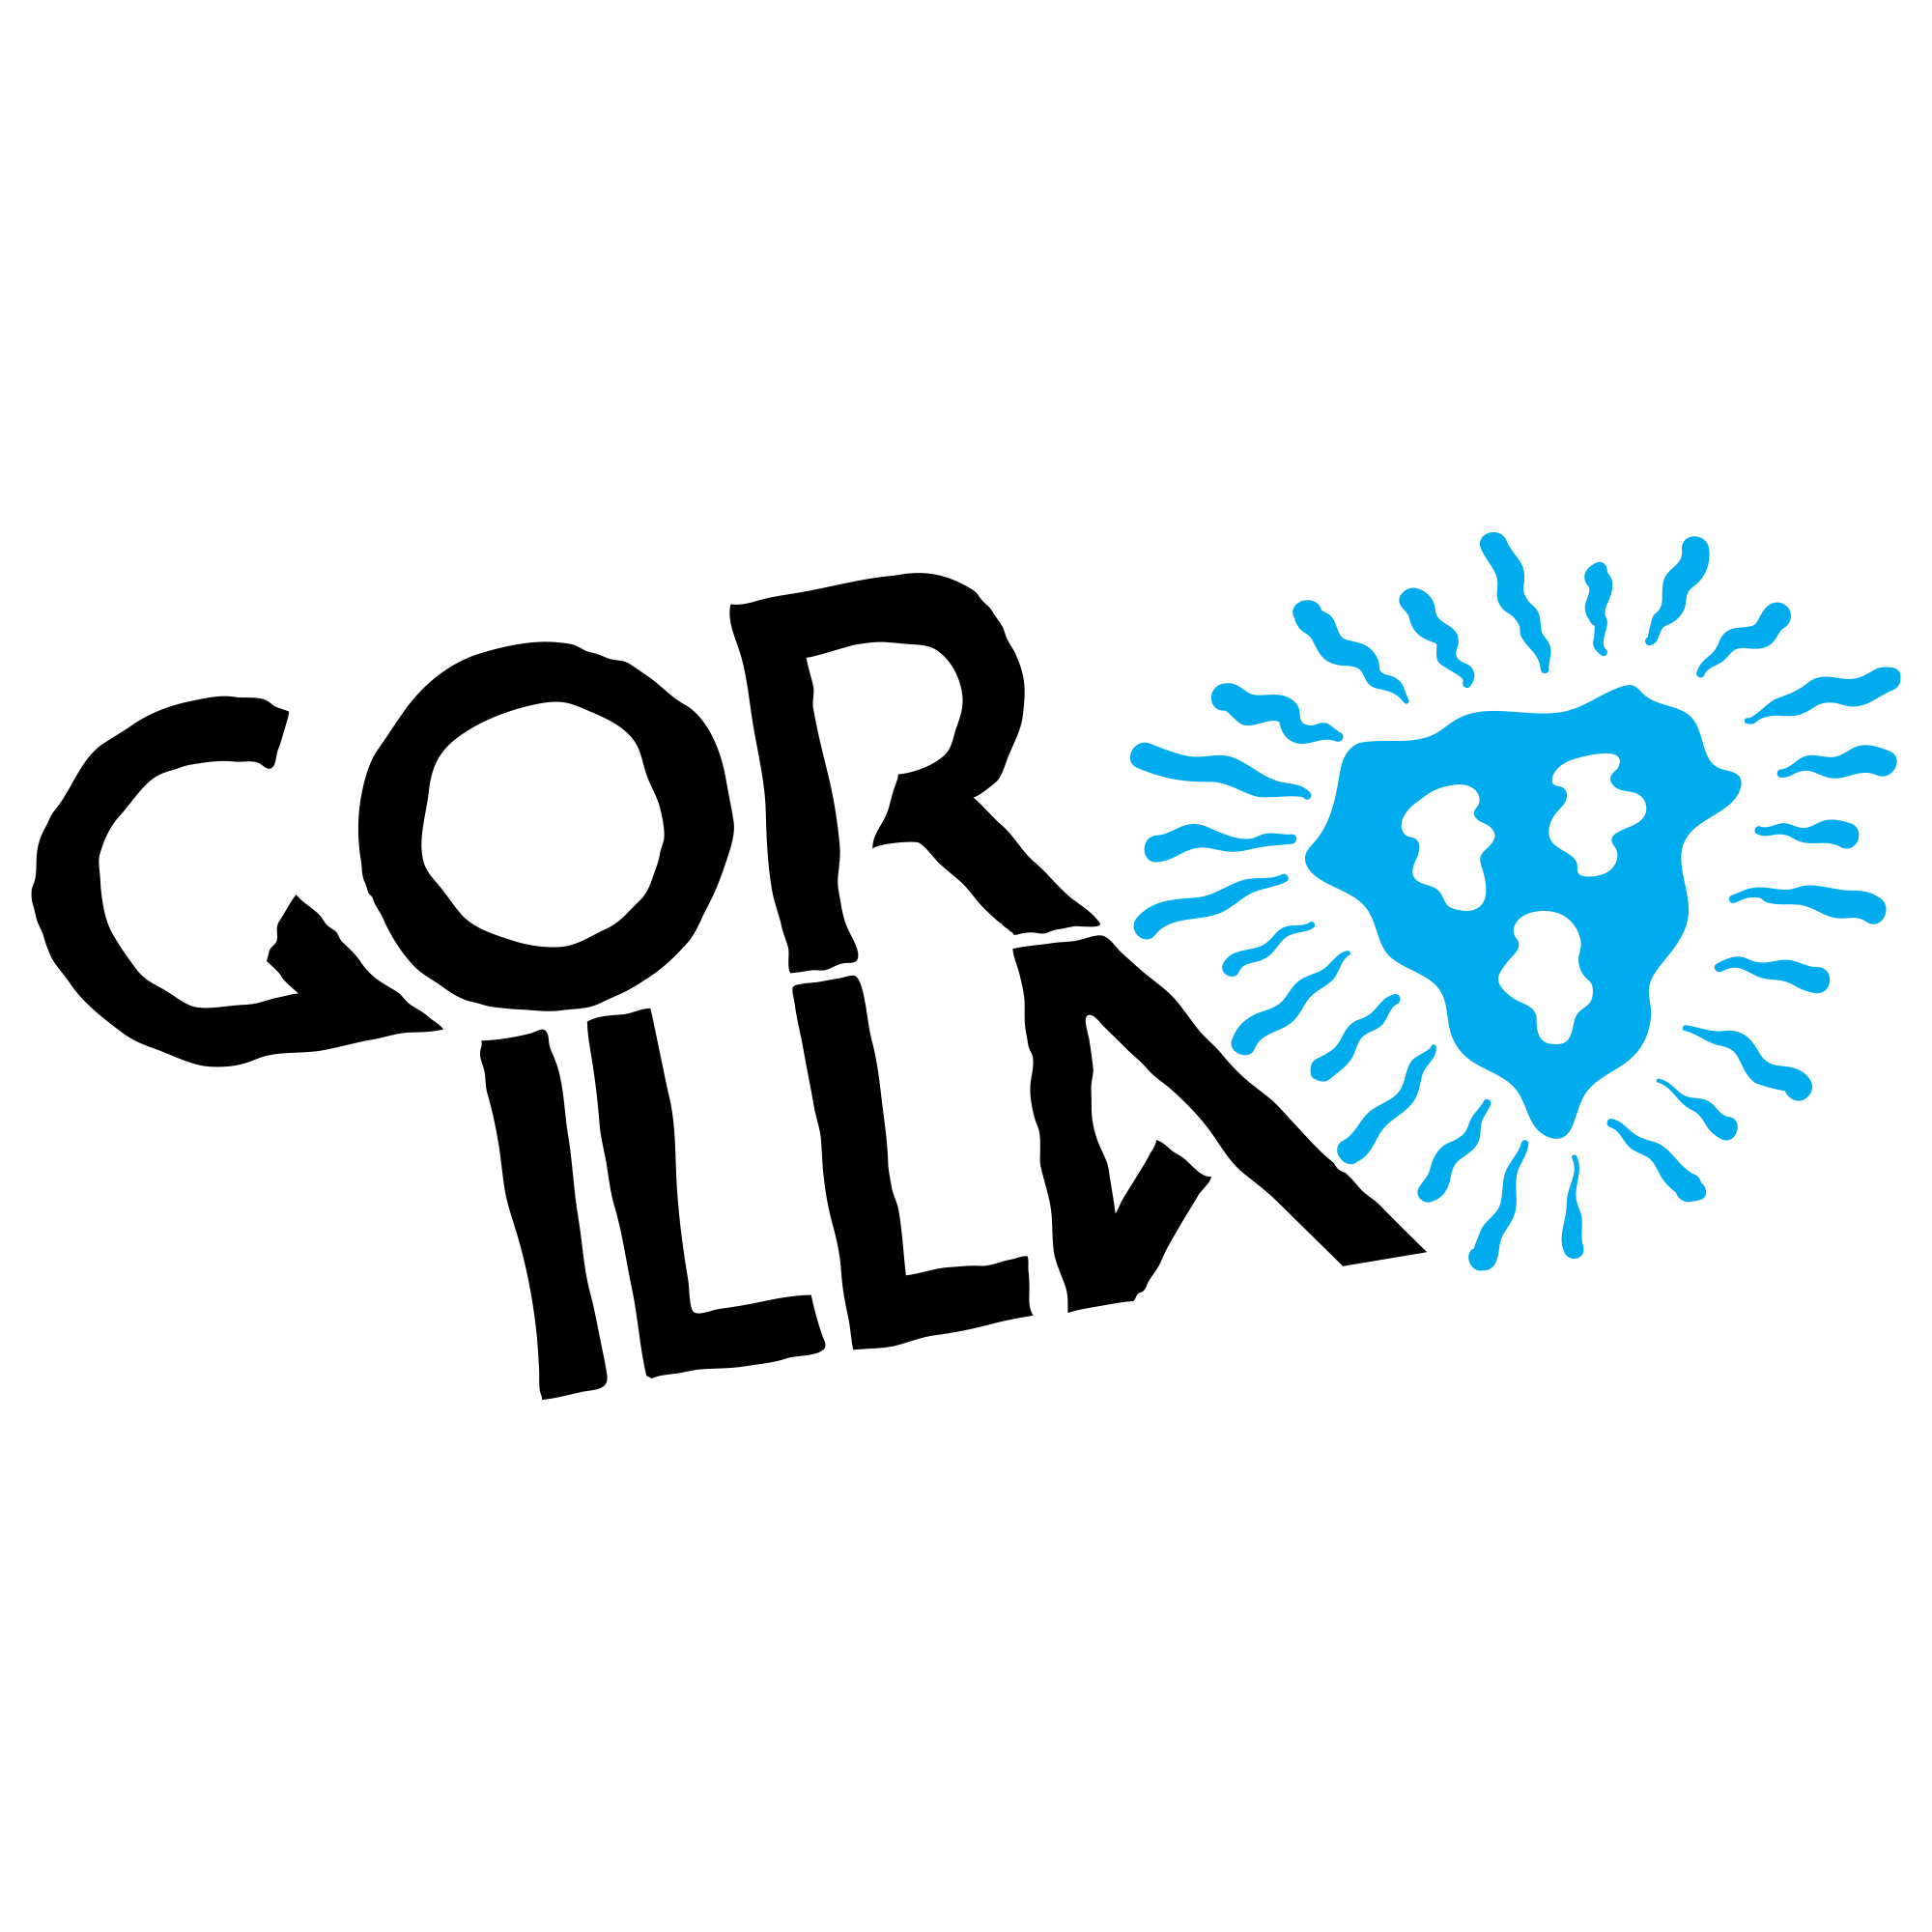 Gorilla-logo.jpg